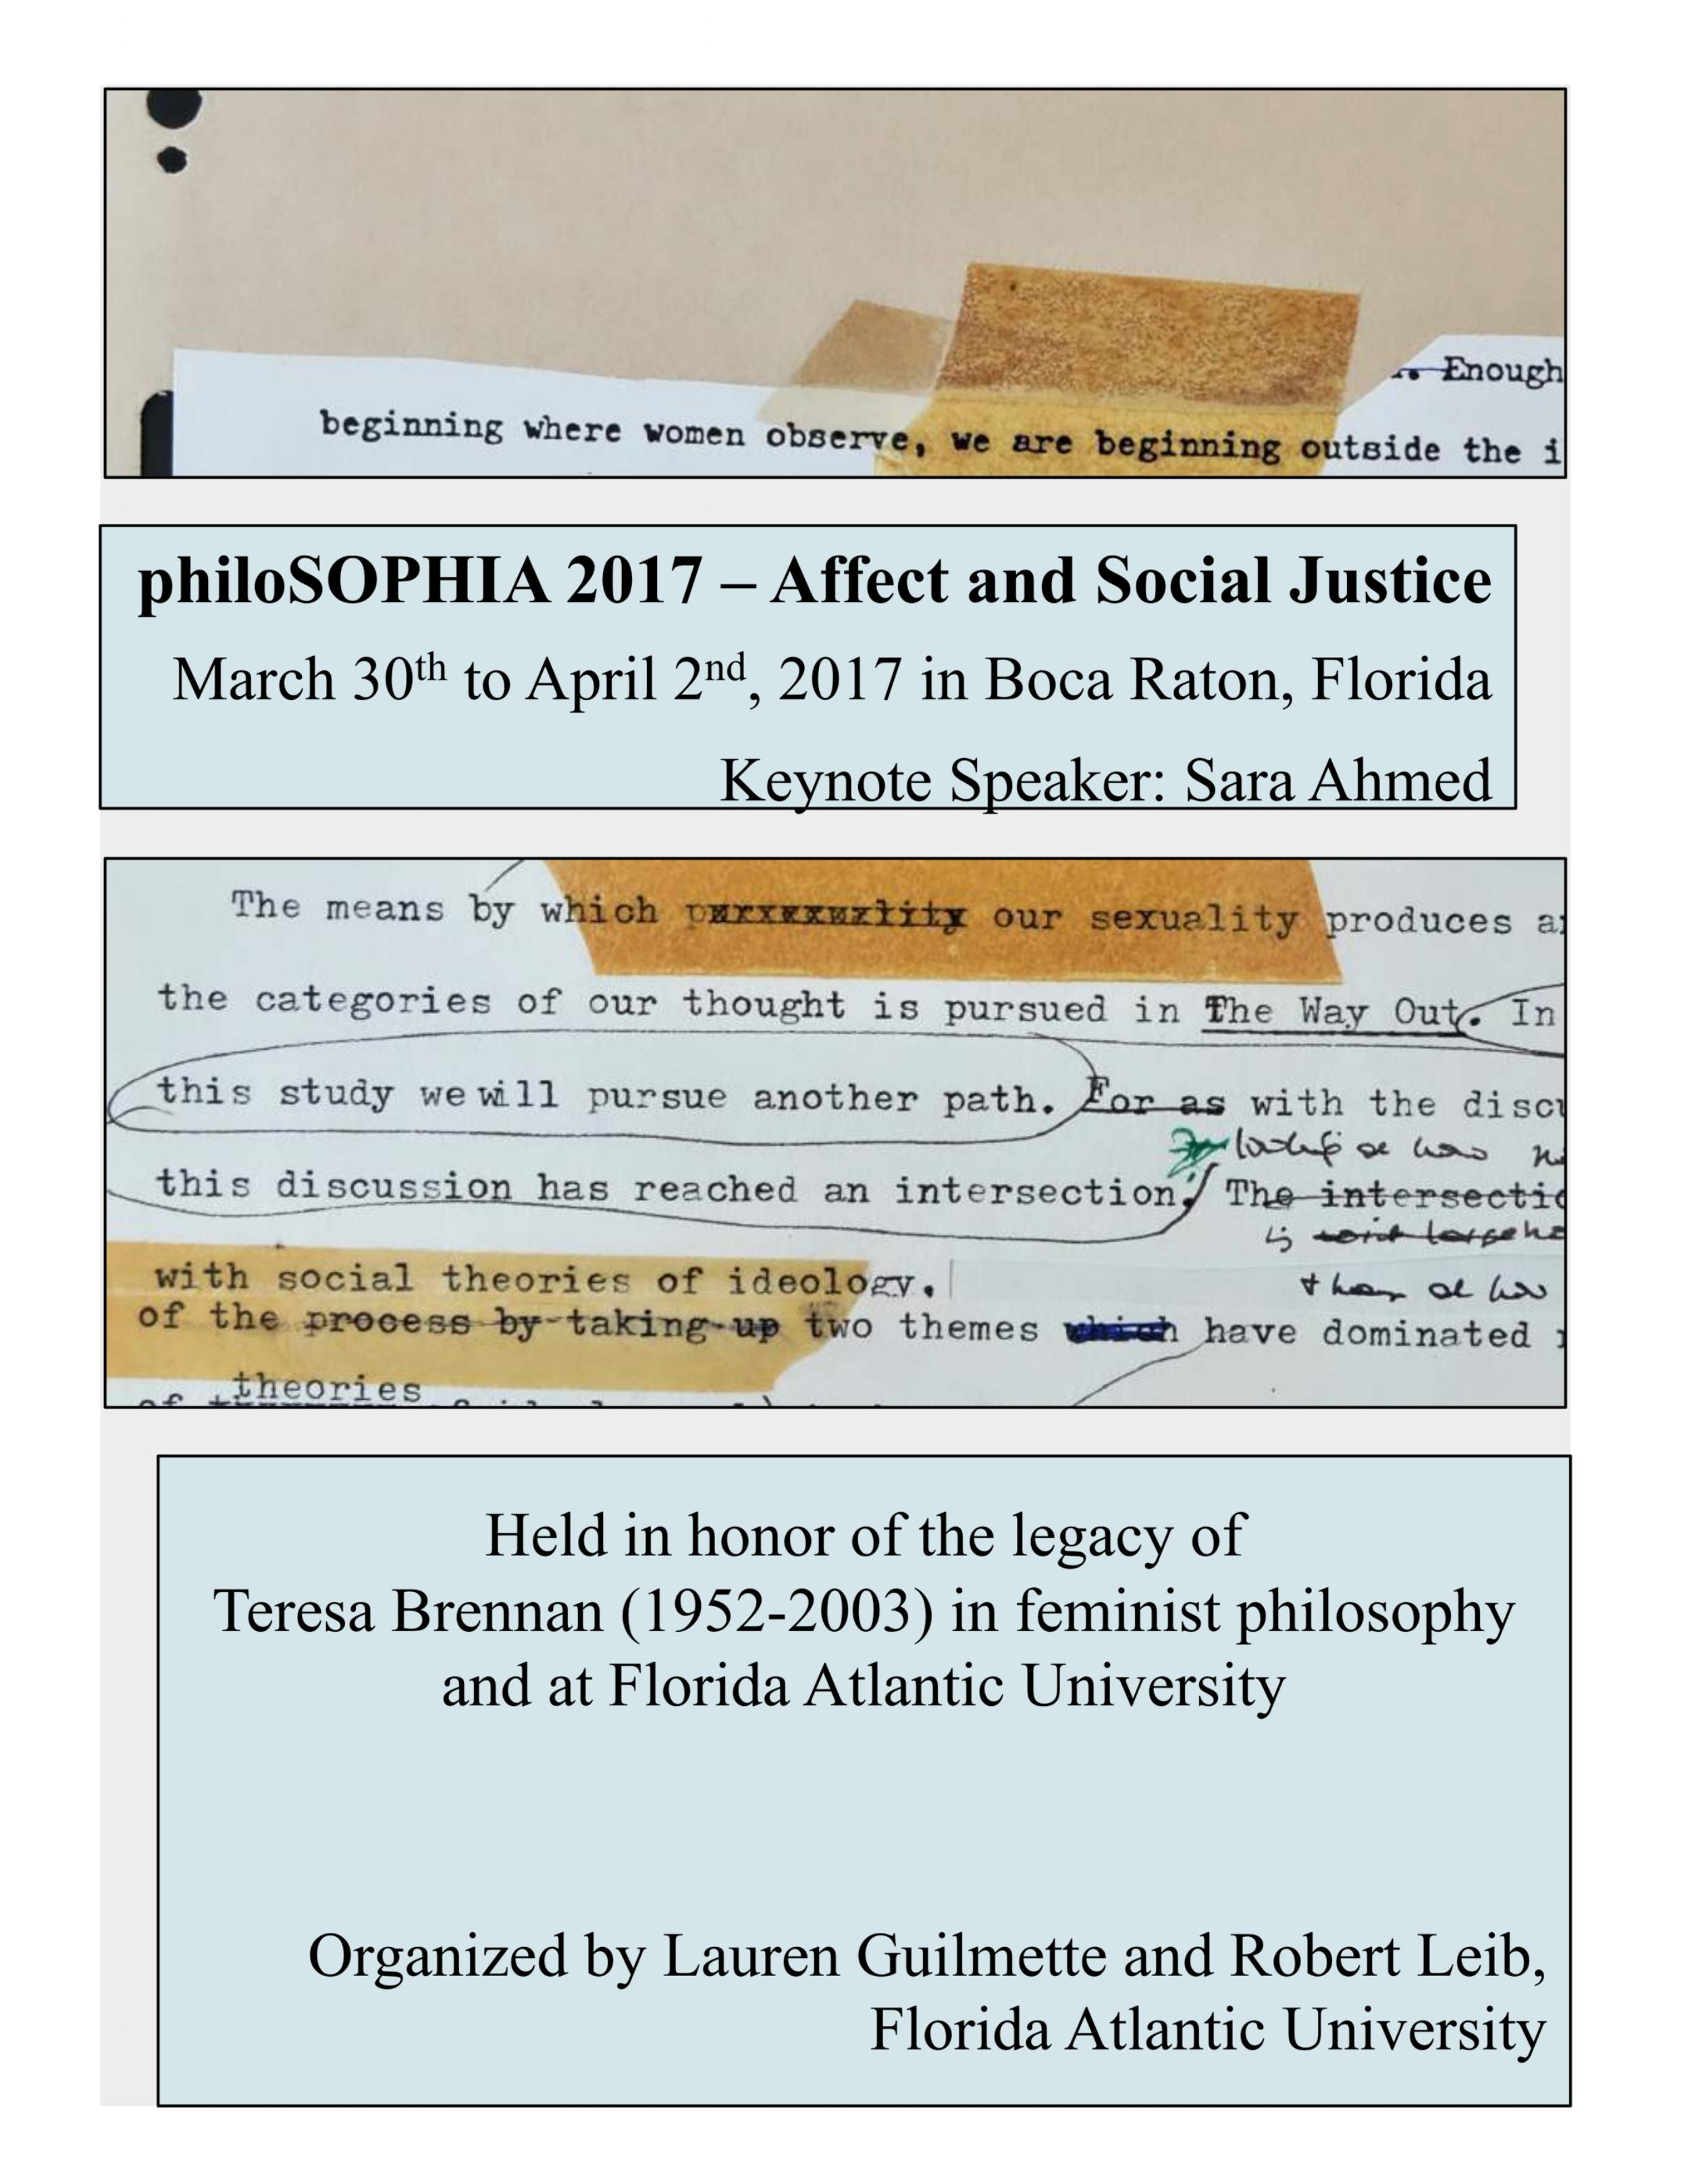 PhiloSOPHIA Program 2017 image.png